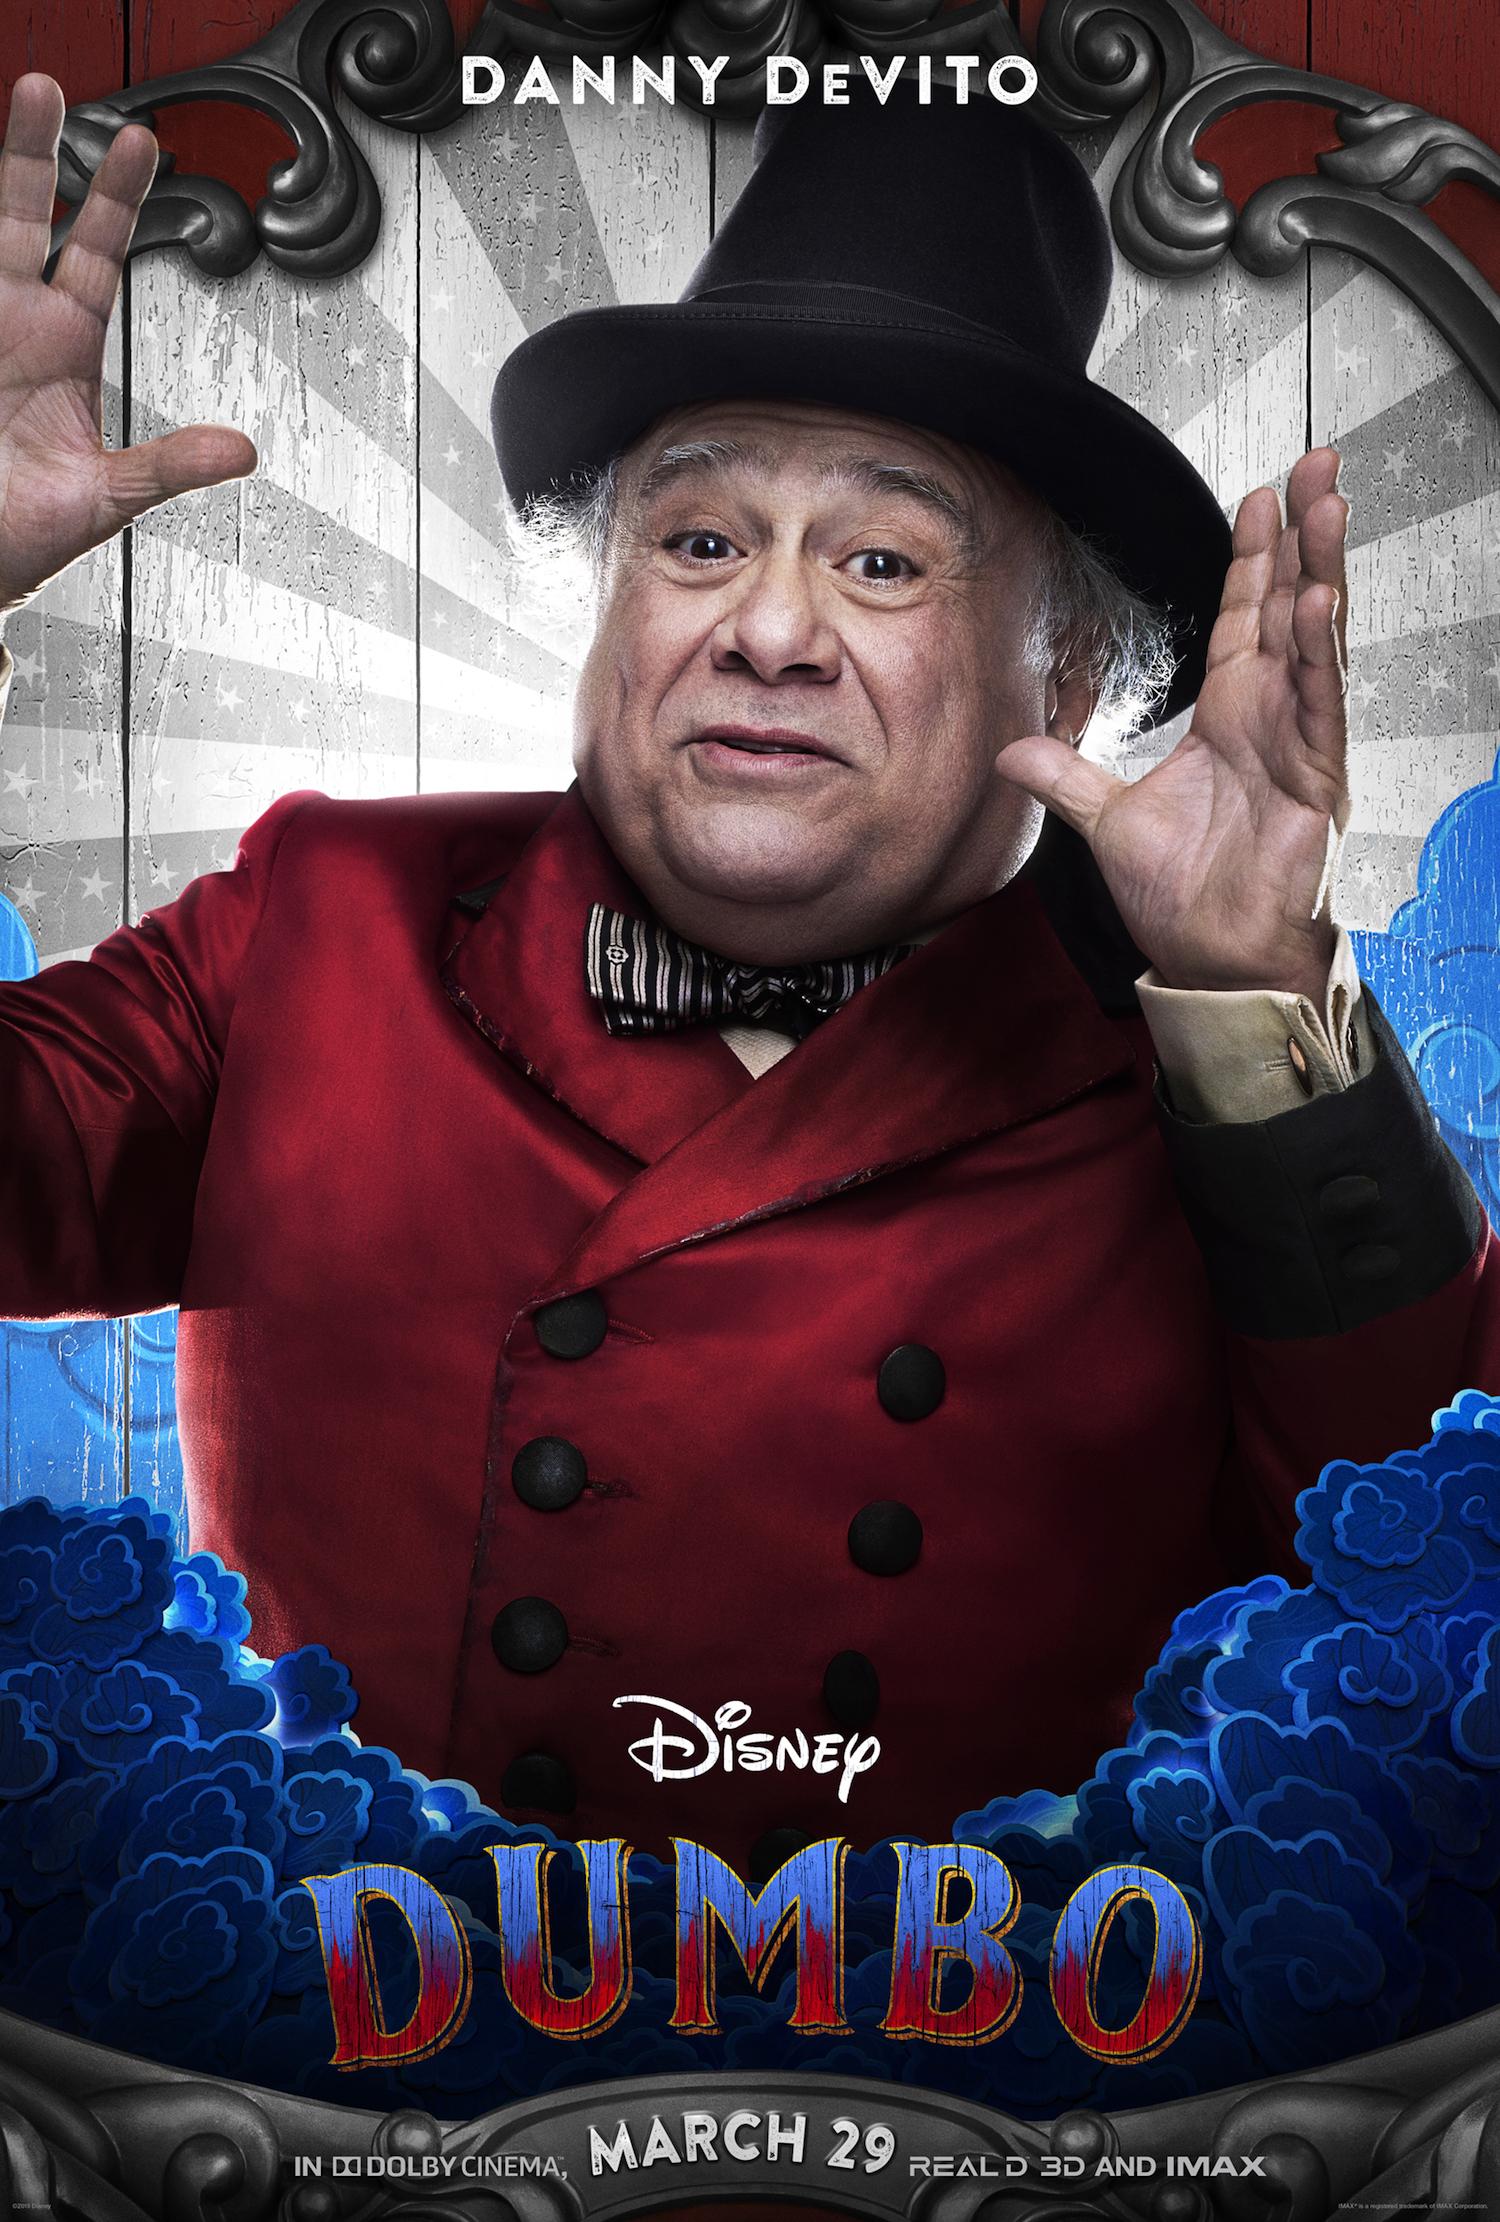 Danny Devito stars in the new live action Disney Dumbo movie.